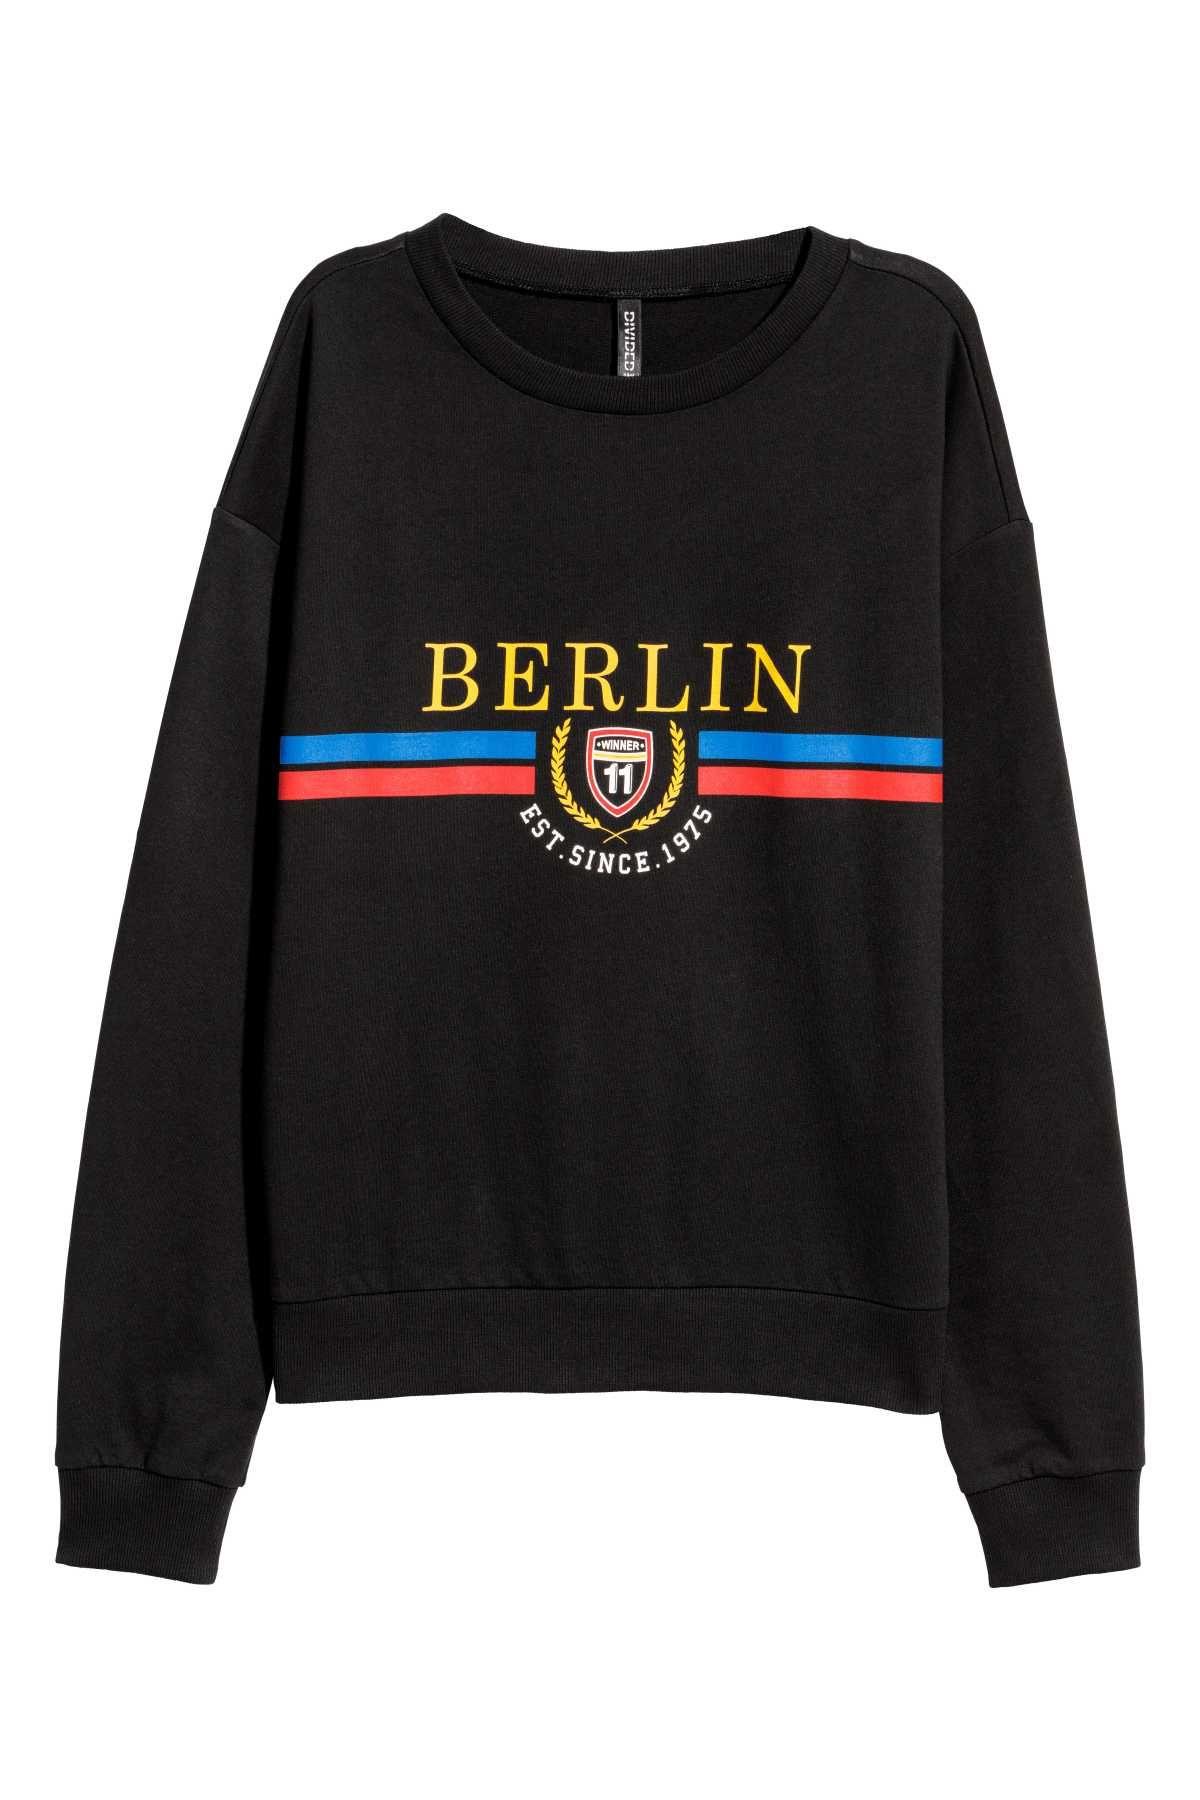 f3912ba6 Sweatshirt with Printed Design | Black/Berlin | WOMEN | H&M US ...